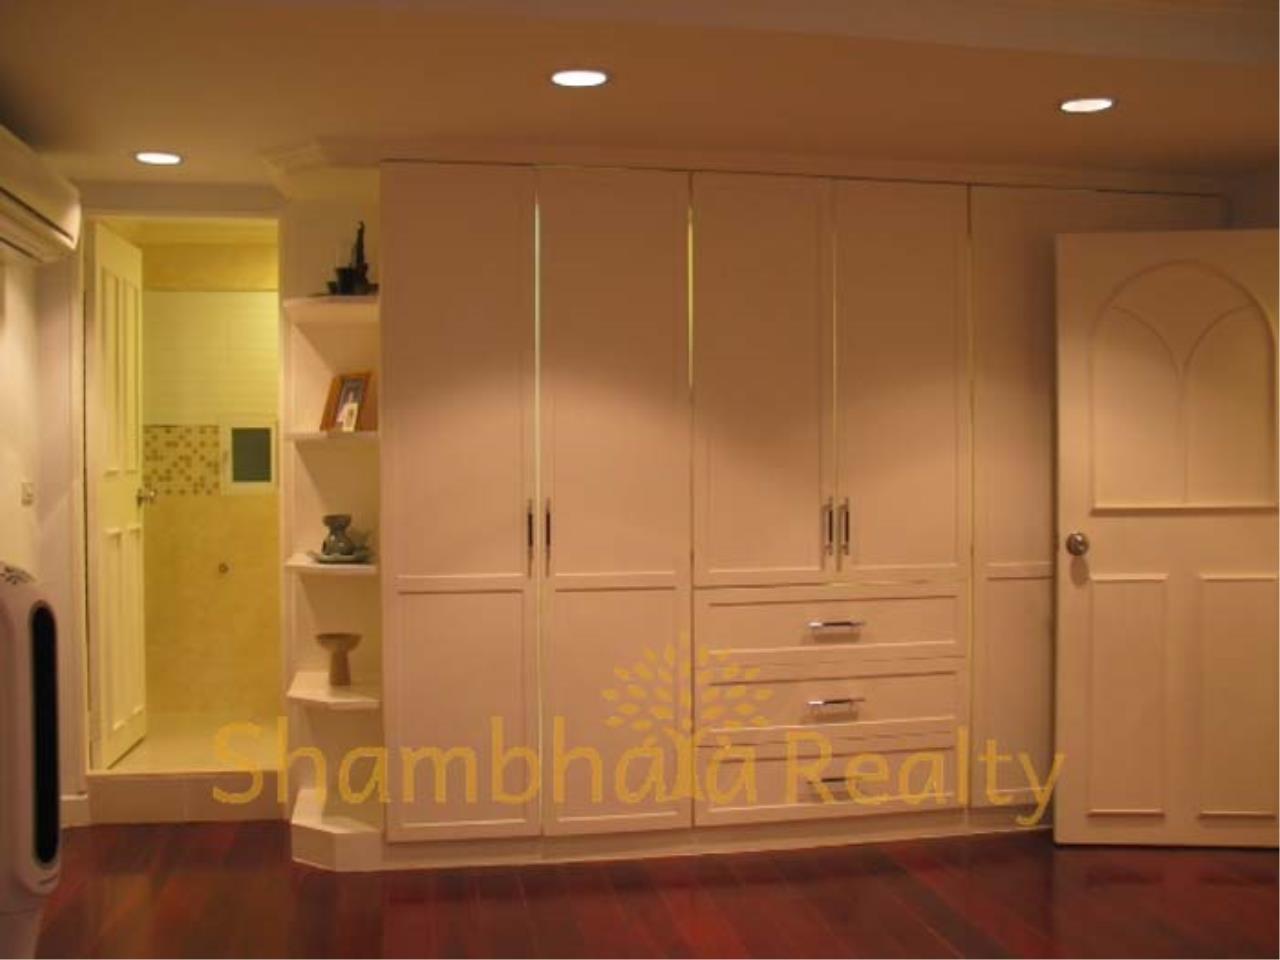 Shambhala Realty Agency's Kiat Thani Condominium for Sale in sukhumvit 31 16